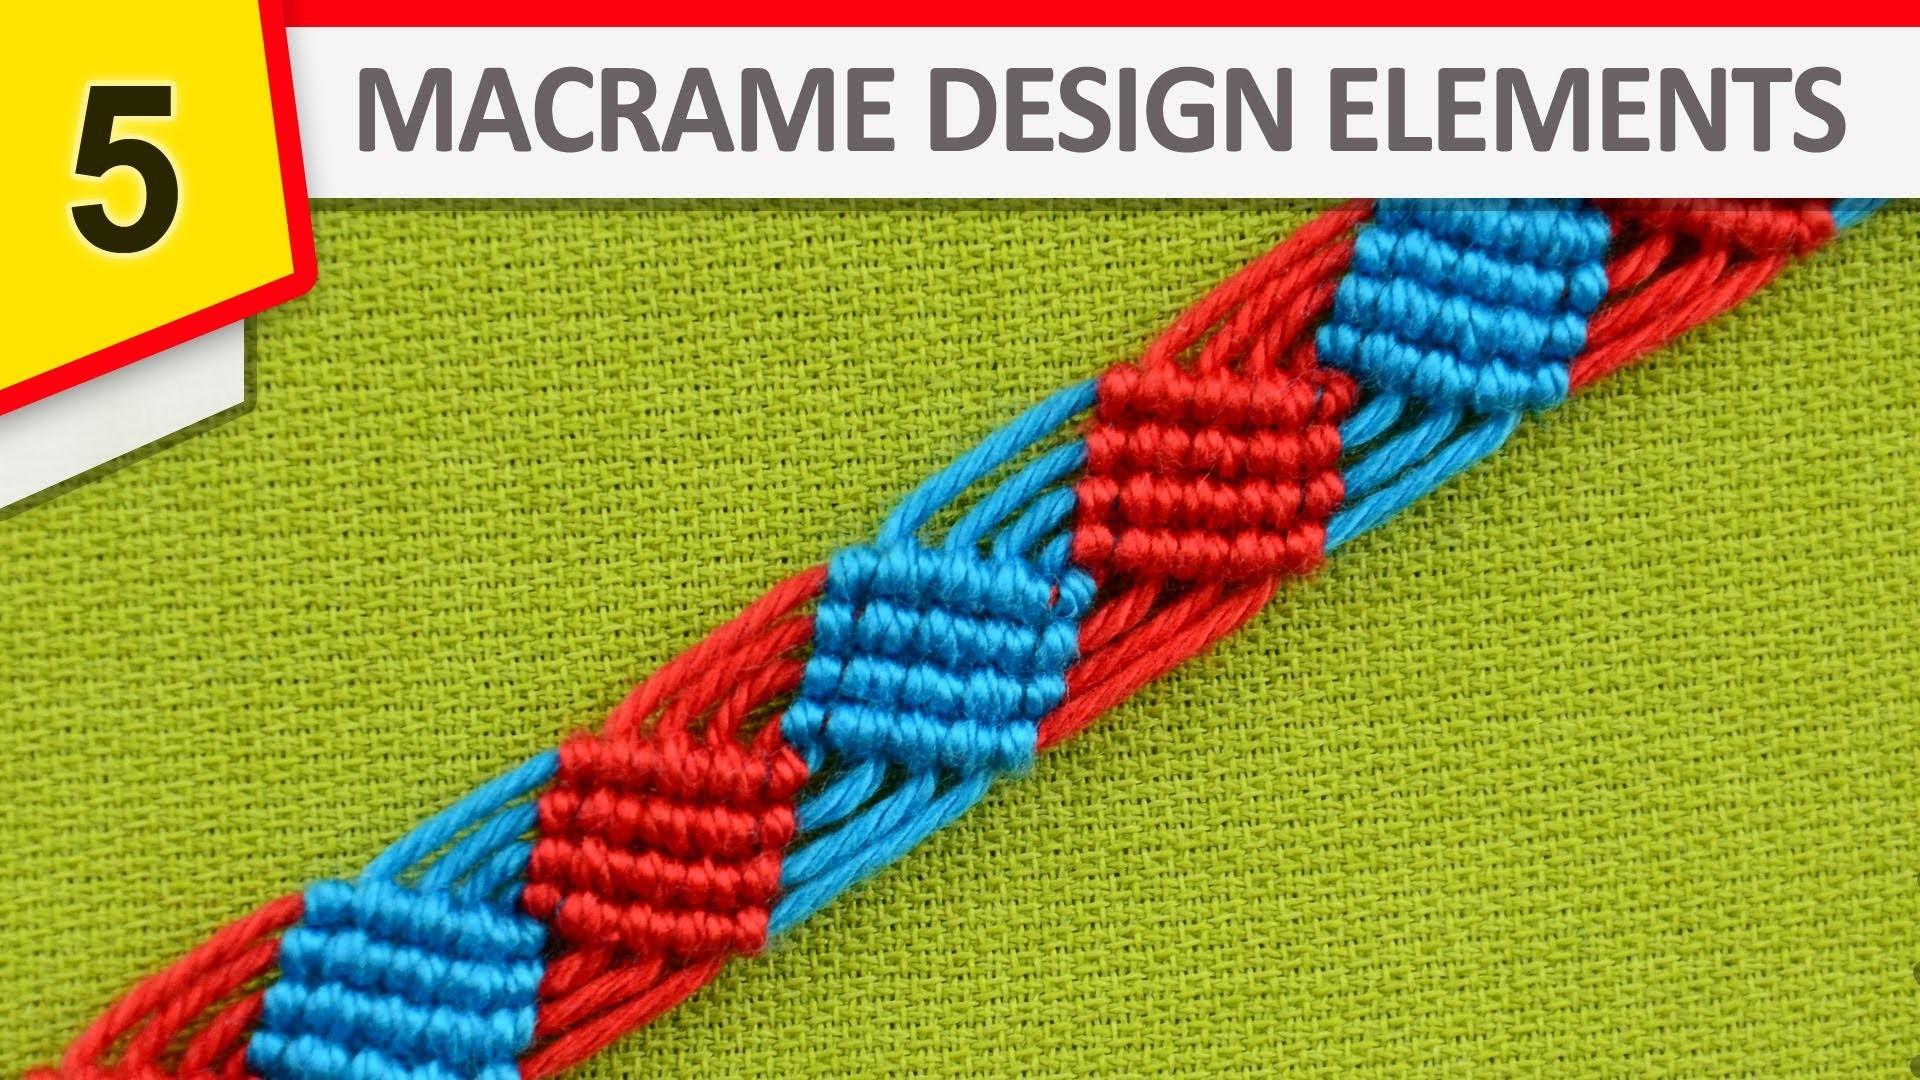 Design Elements - Squares, Diamonds, Rhombs (DIY)